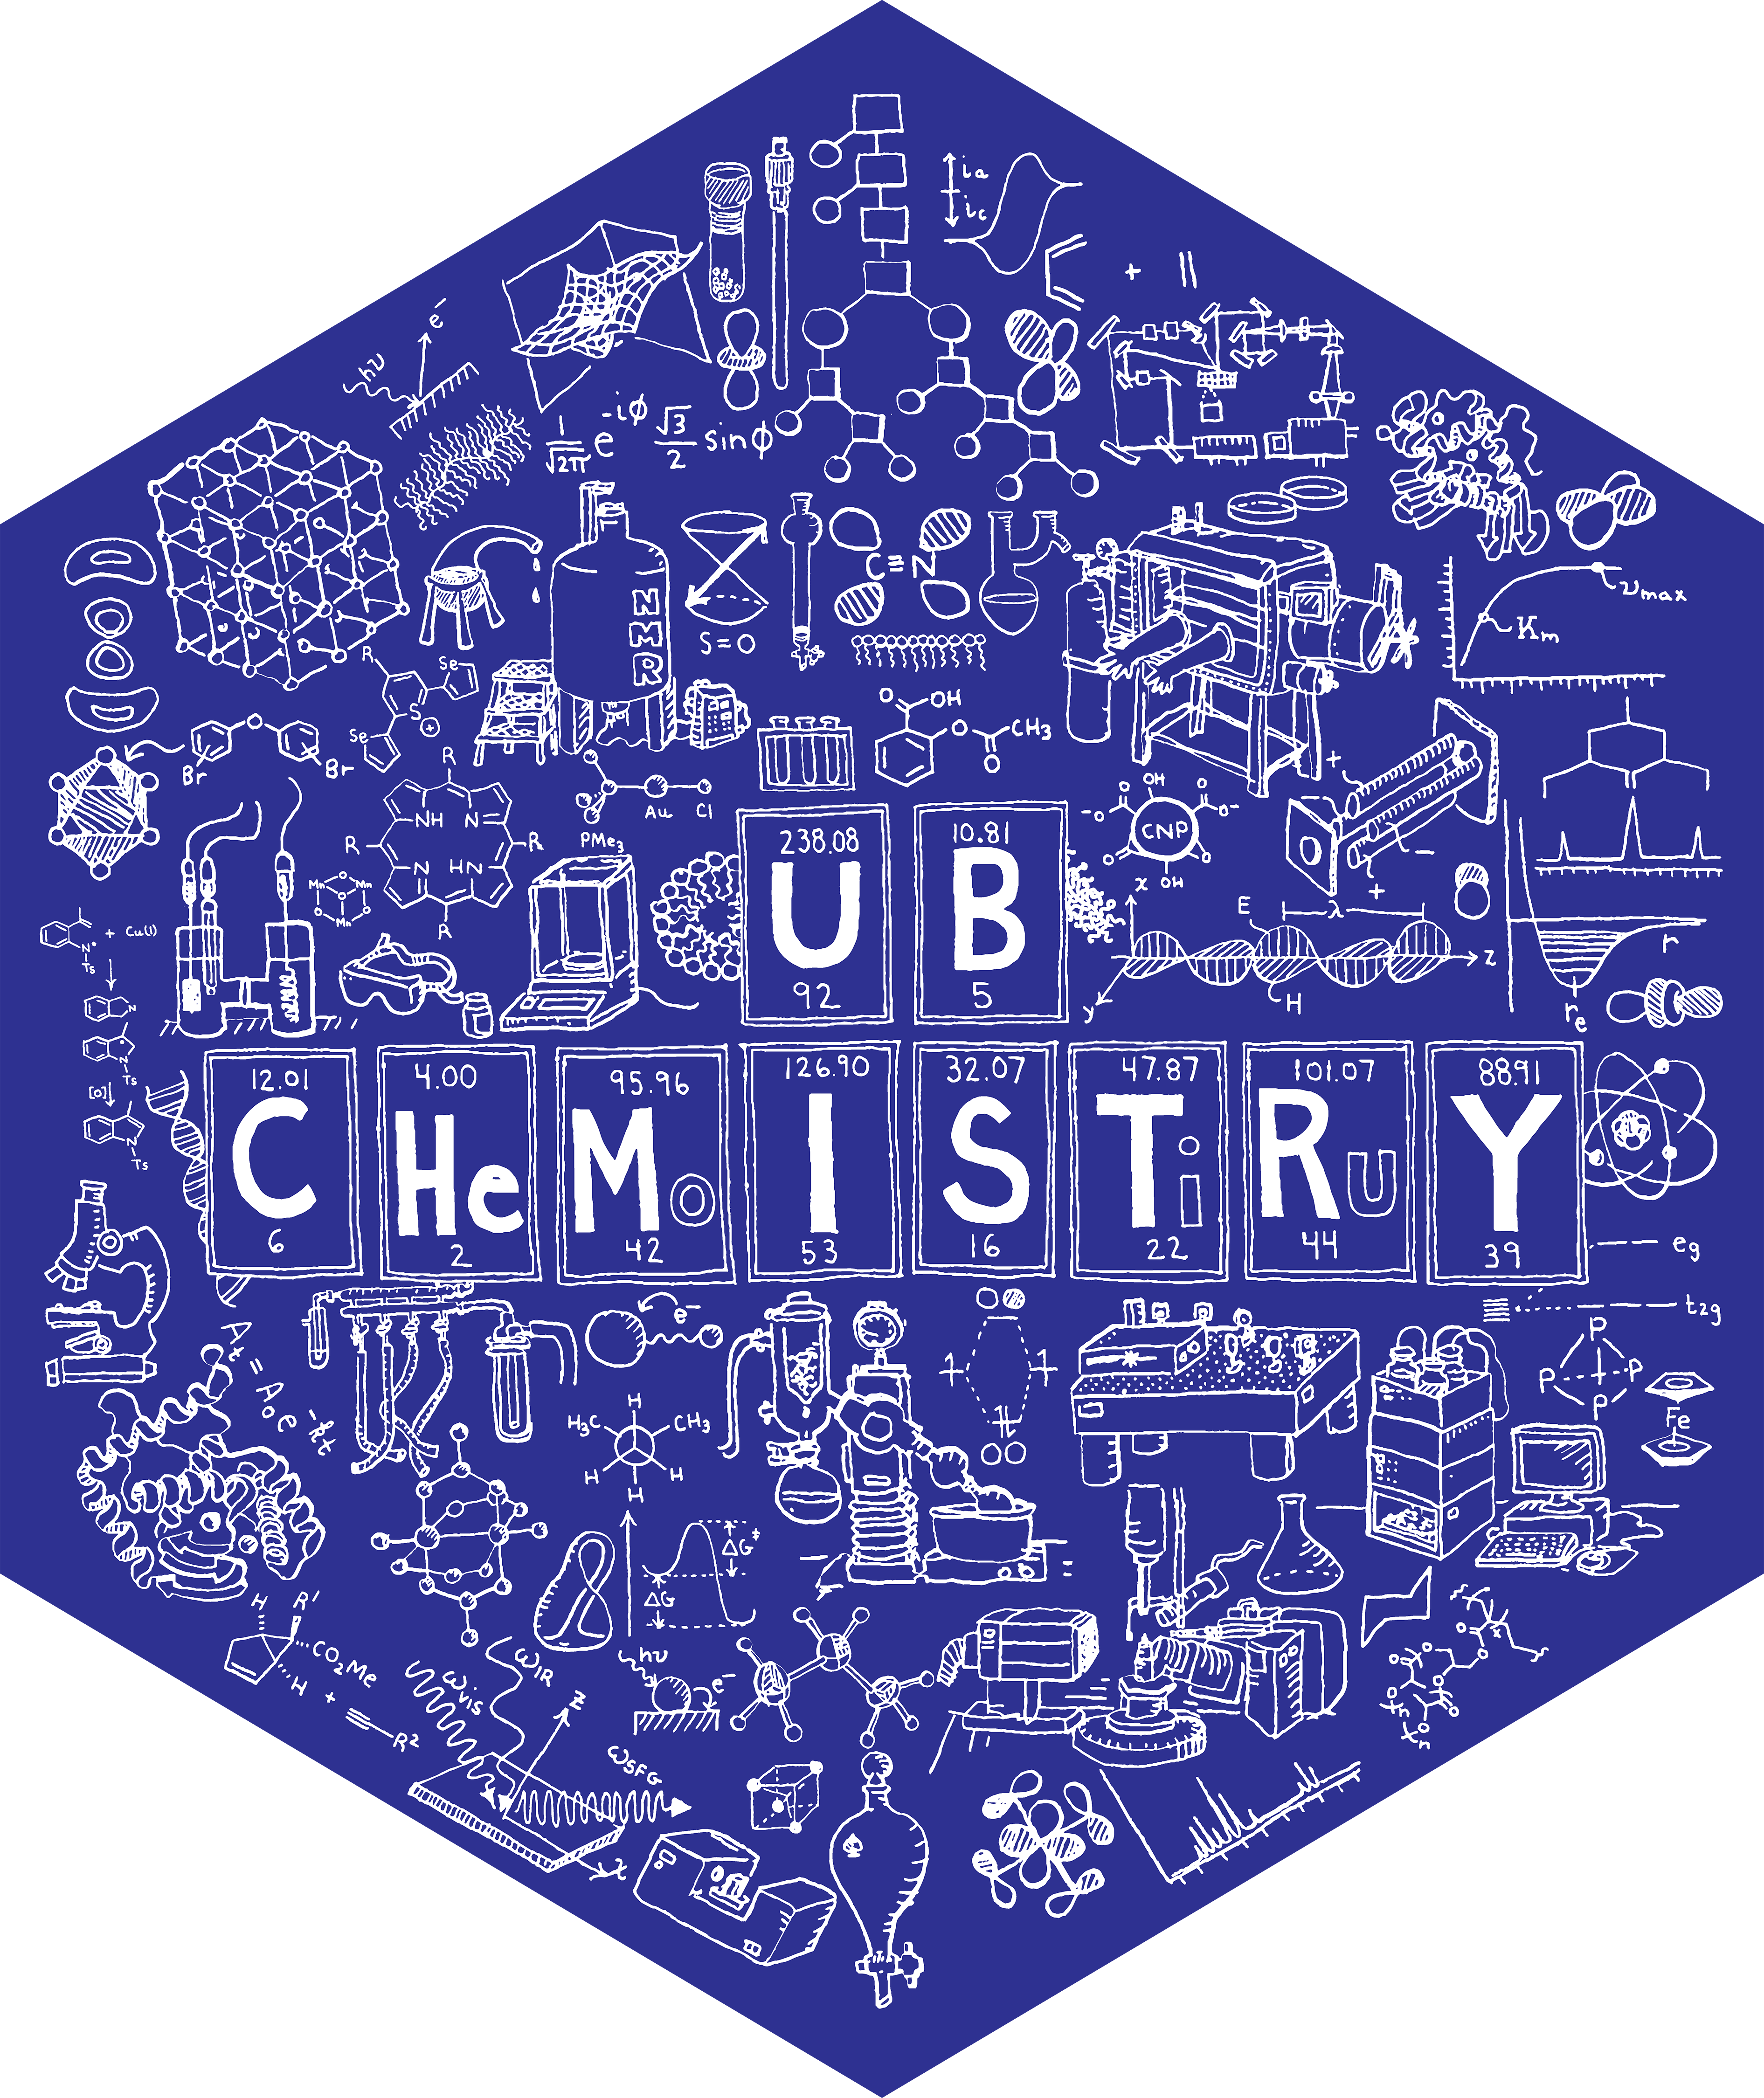 Cook UB Chemistry sketch